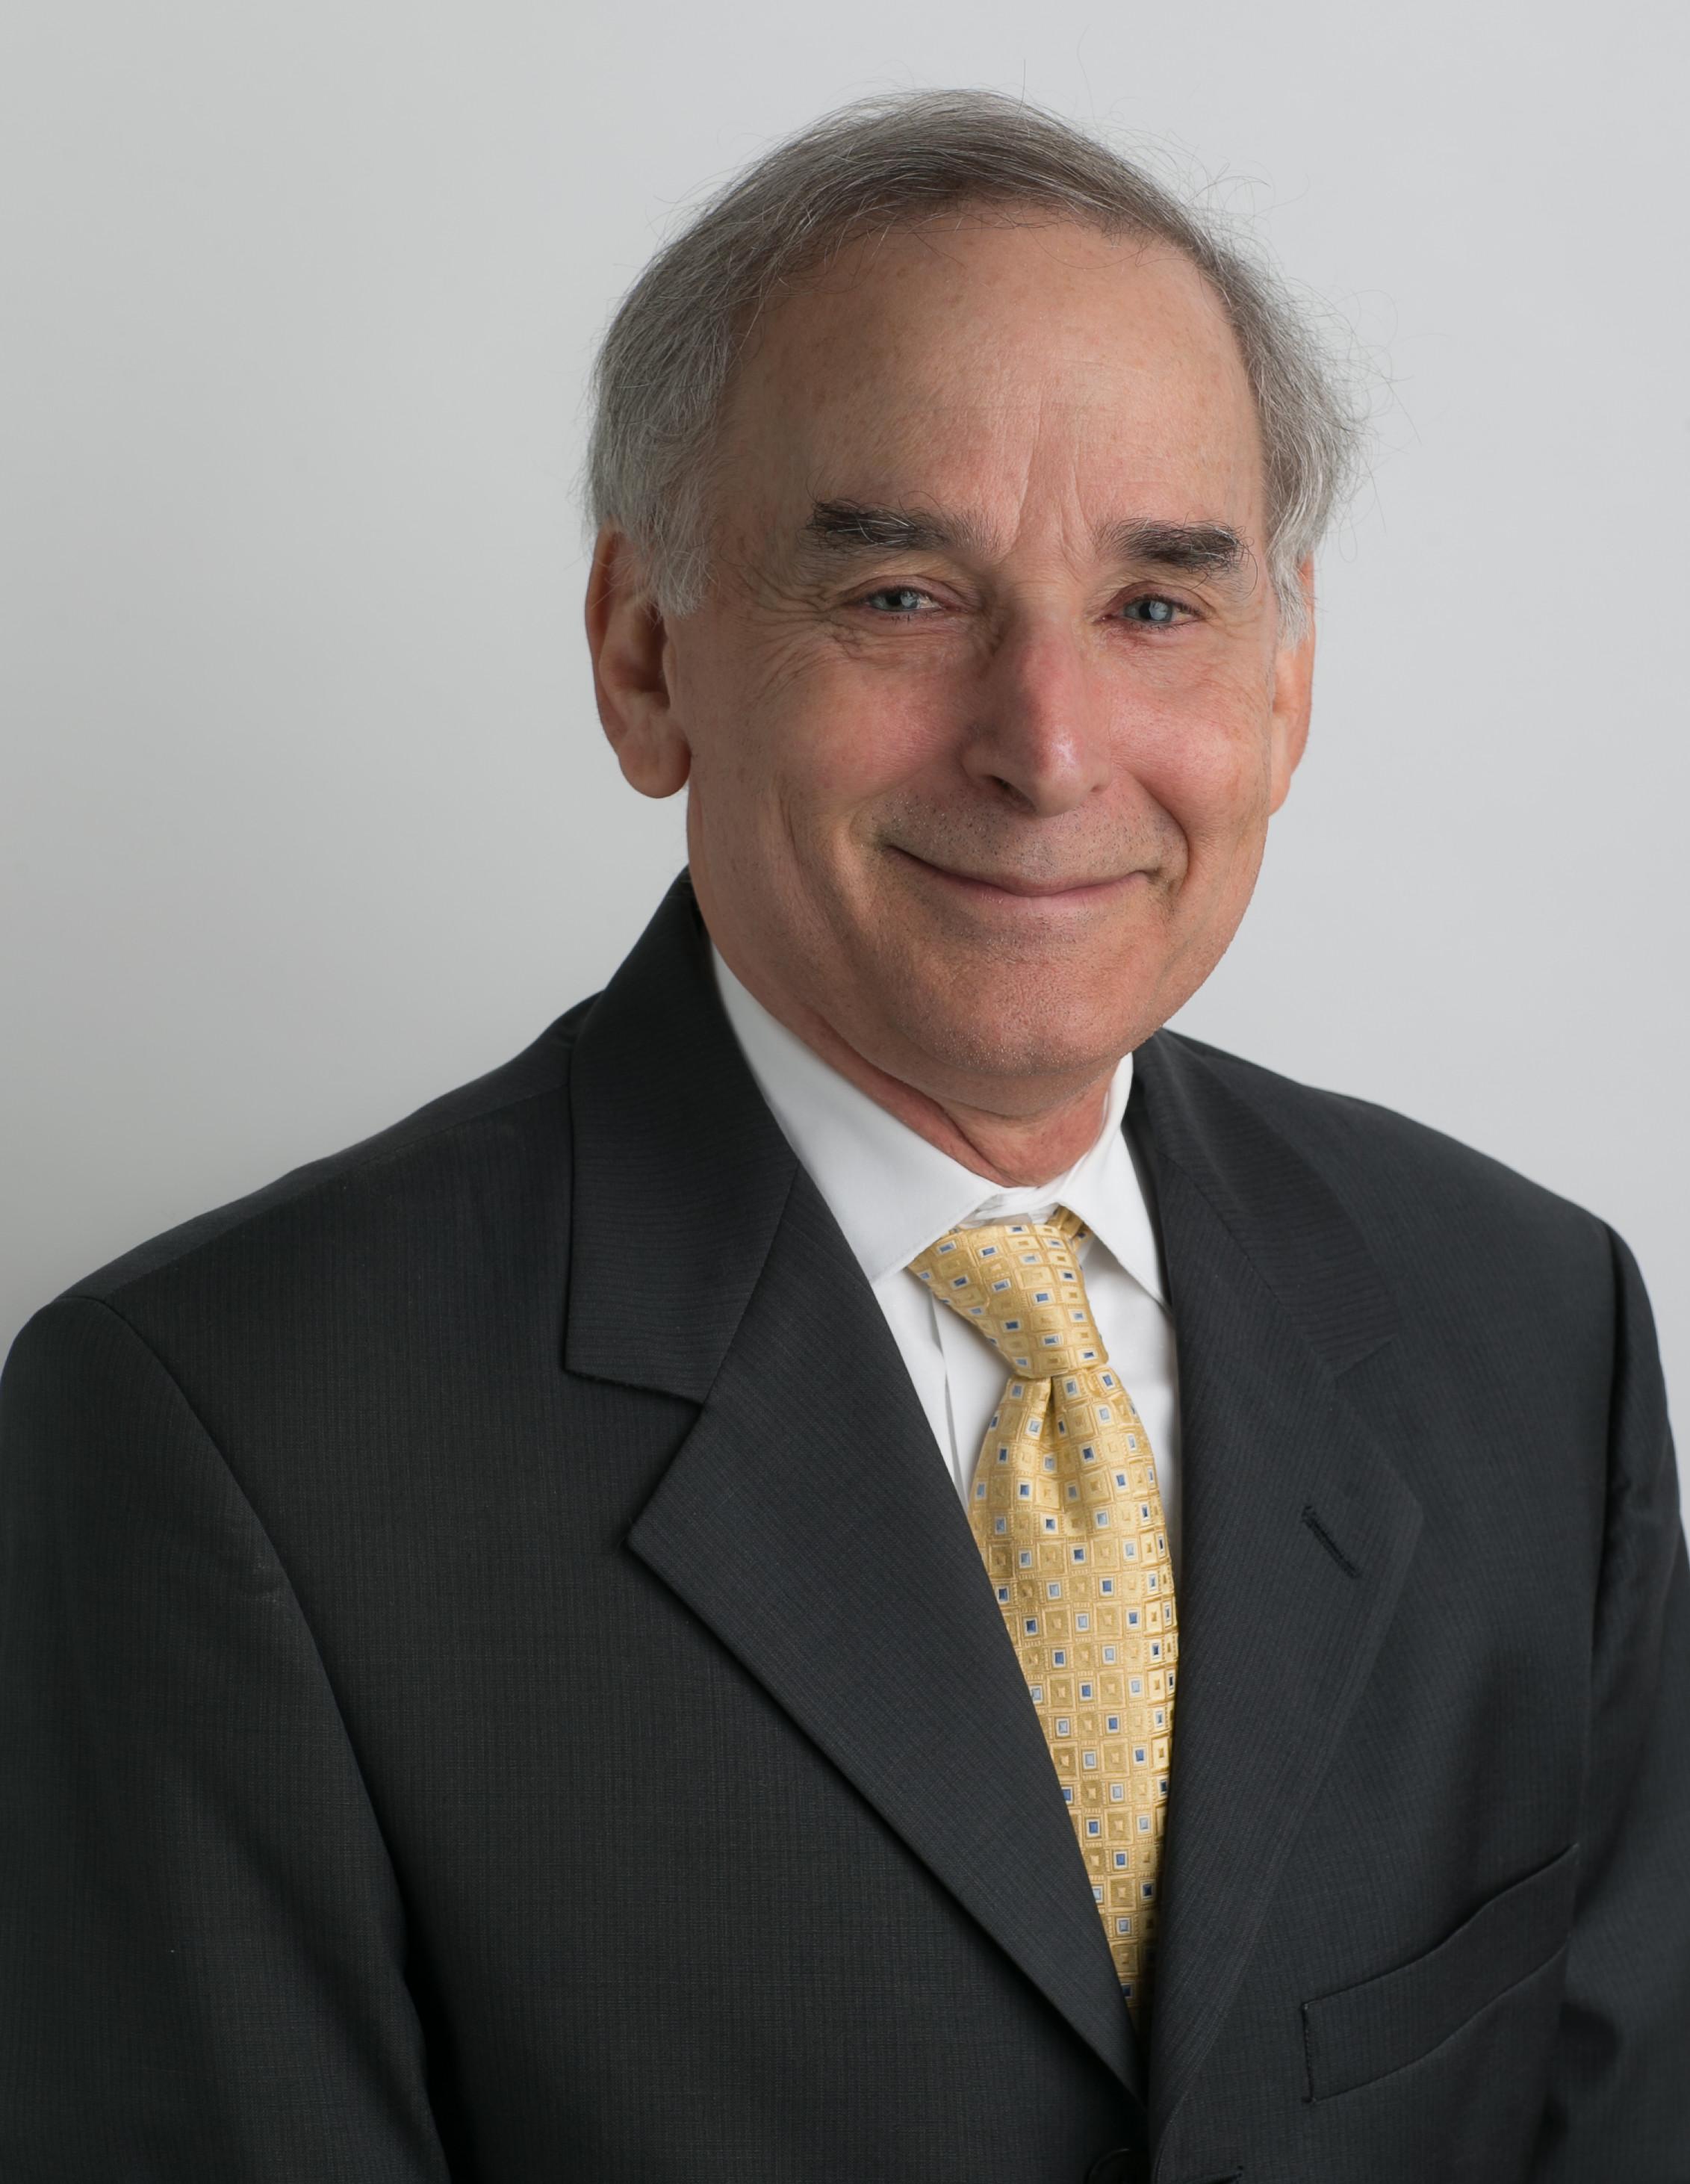 Richard A Levine